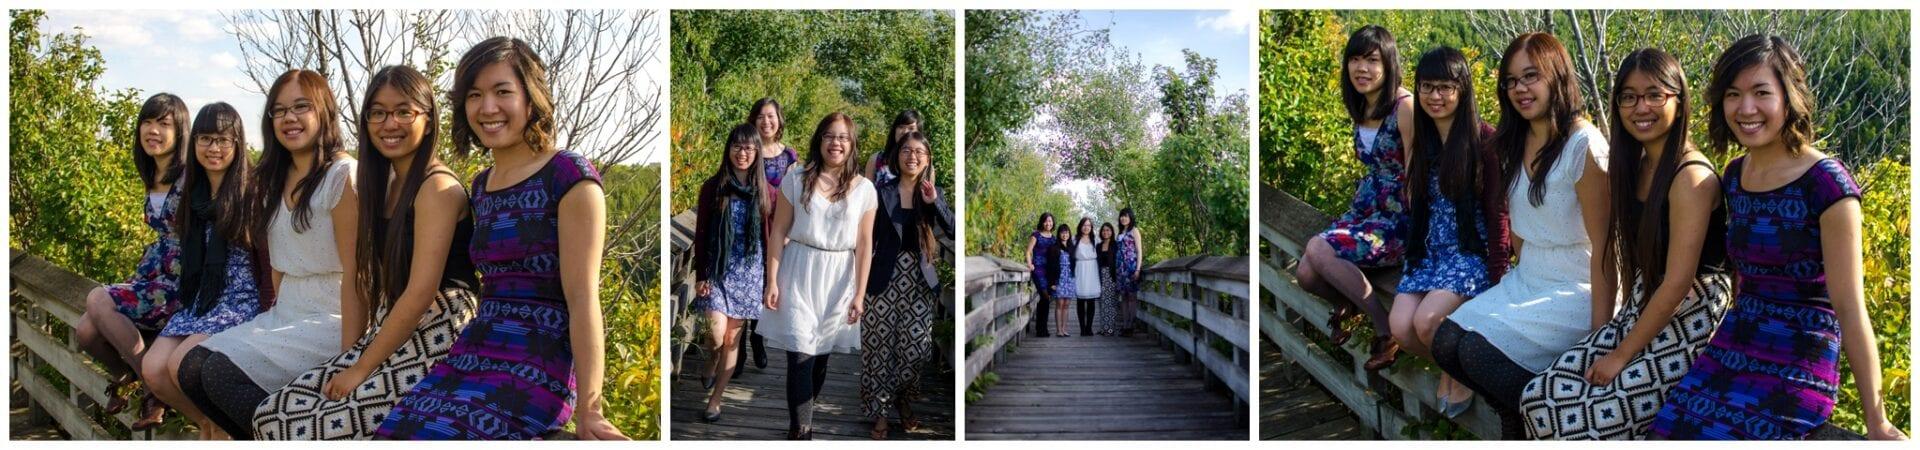 Sherwood Park Edmonton-scenery-bridge-forest-nature-mpstudio-001